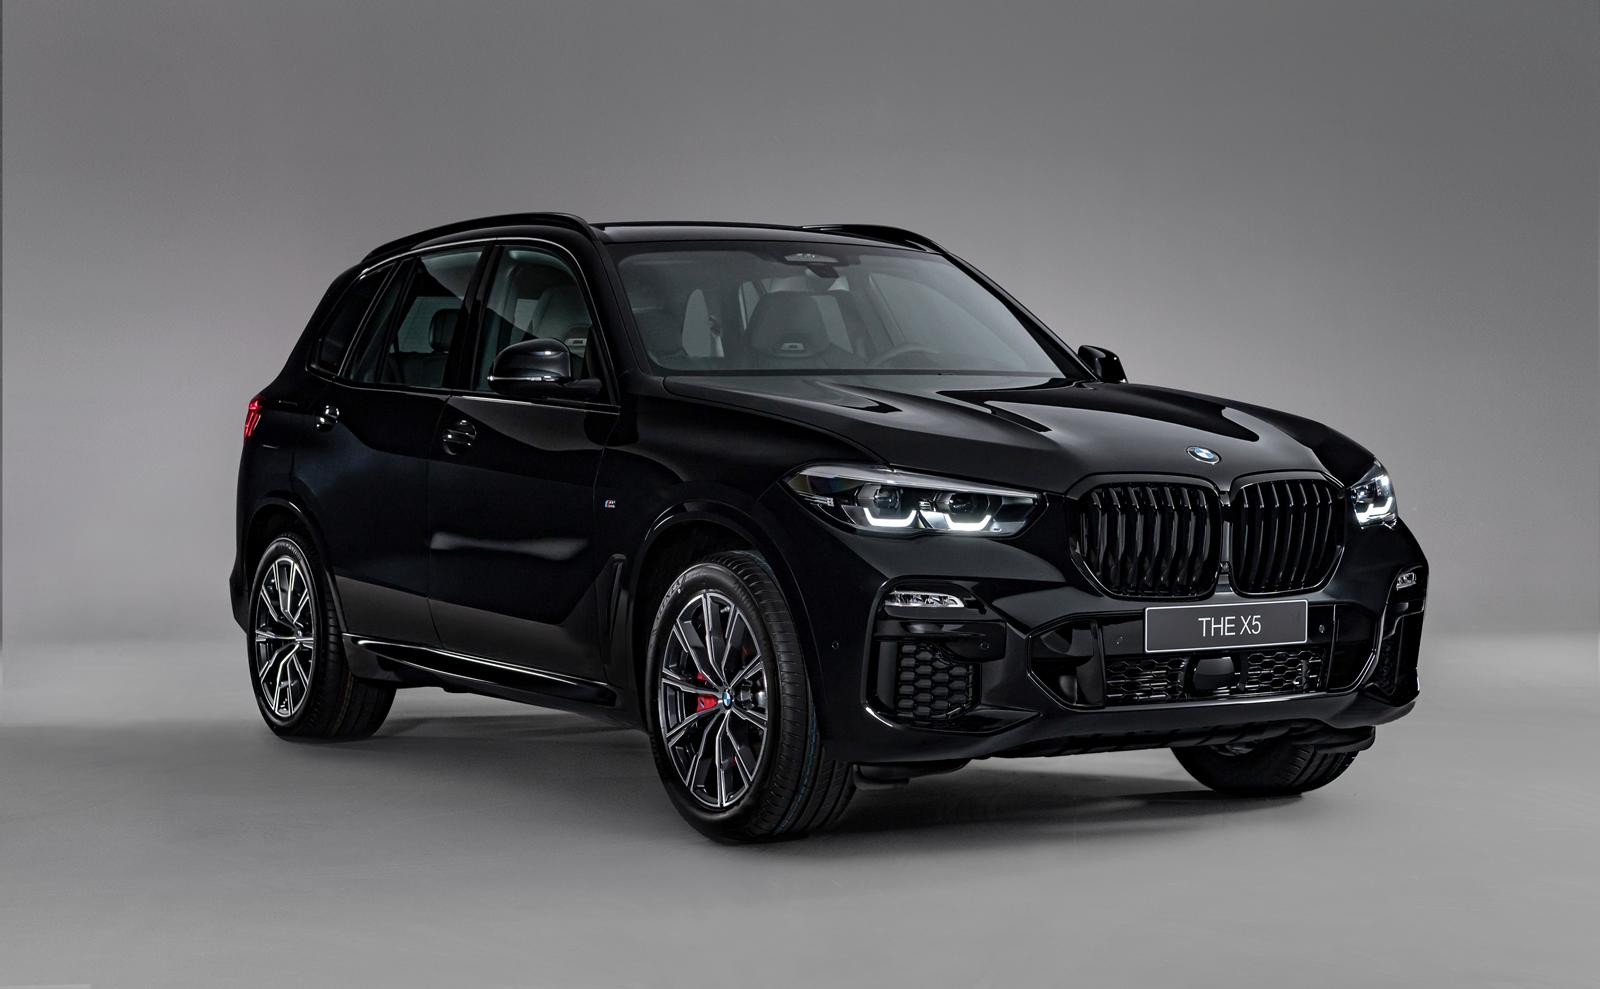 BMW X5 Dark Knight曜黑版。